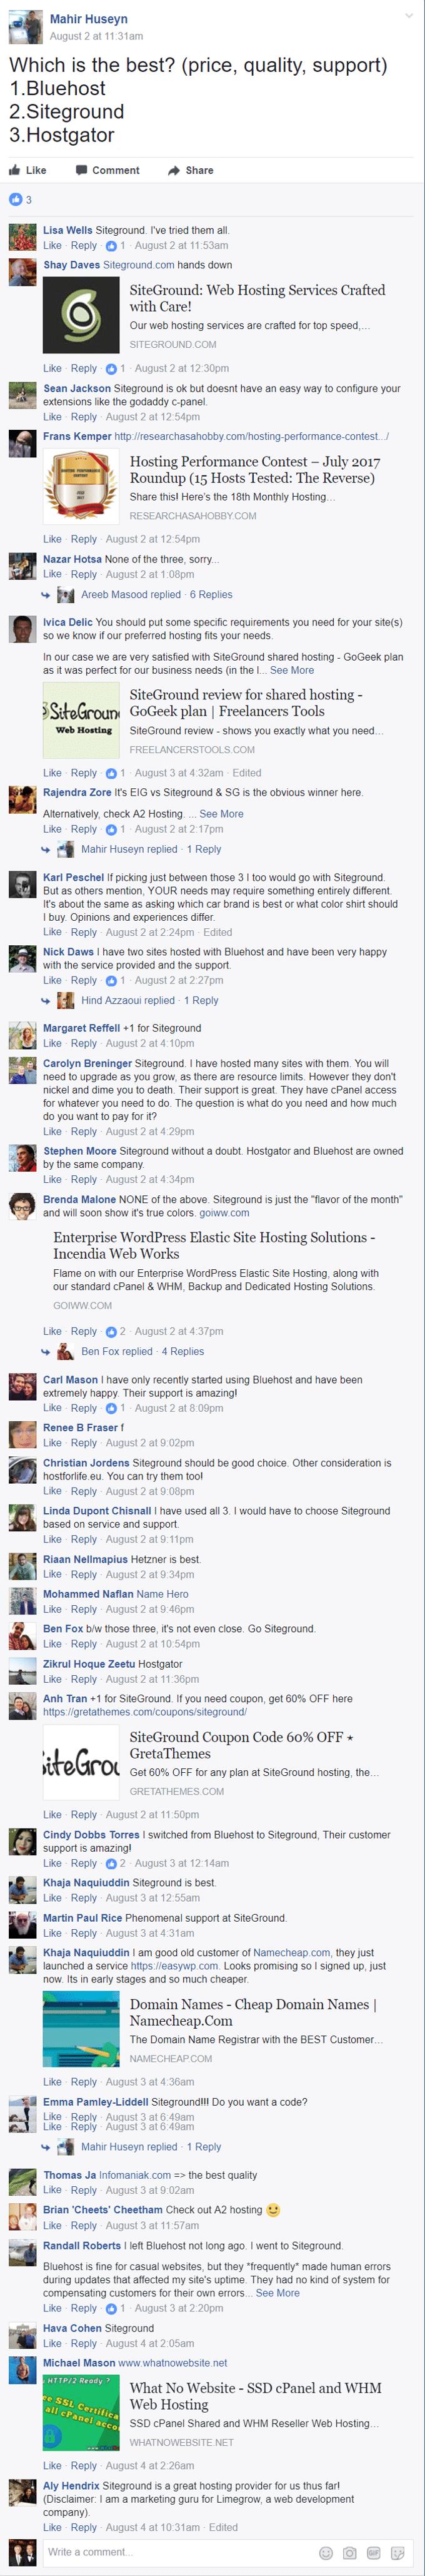 siteground vs bluehost facebook thread result latest